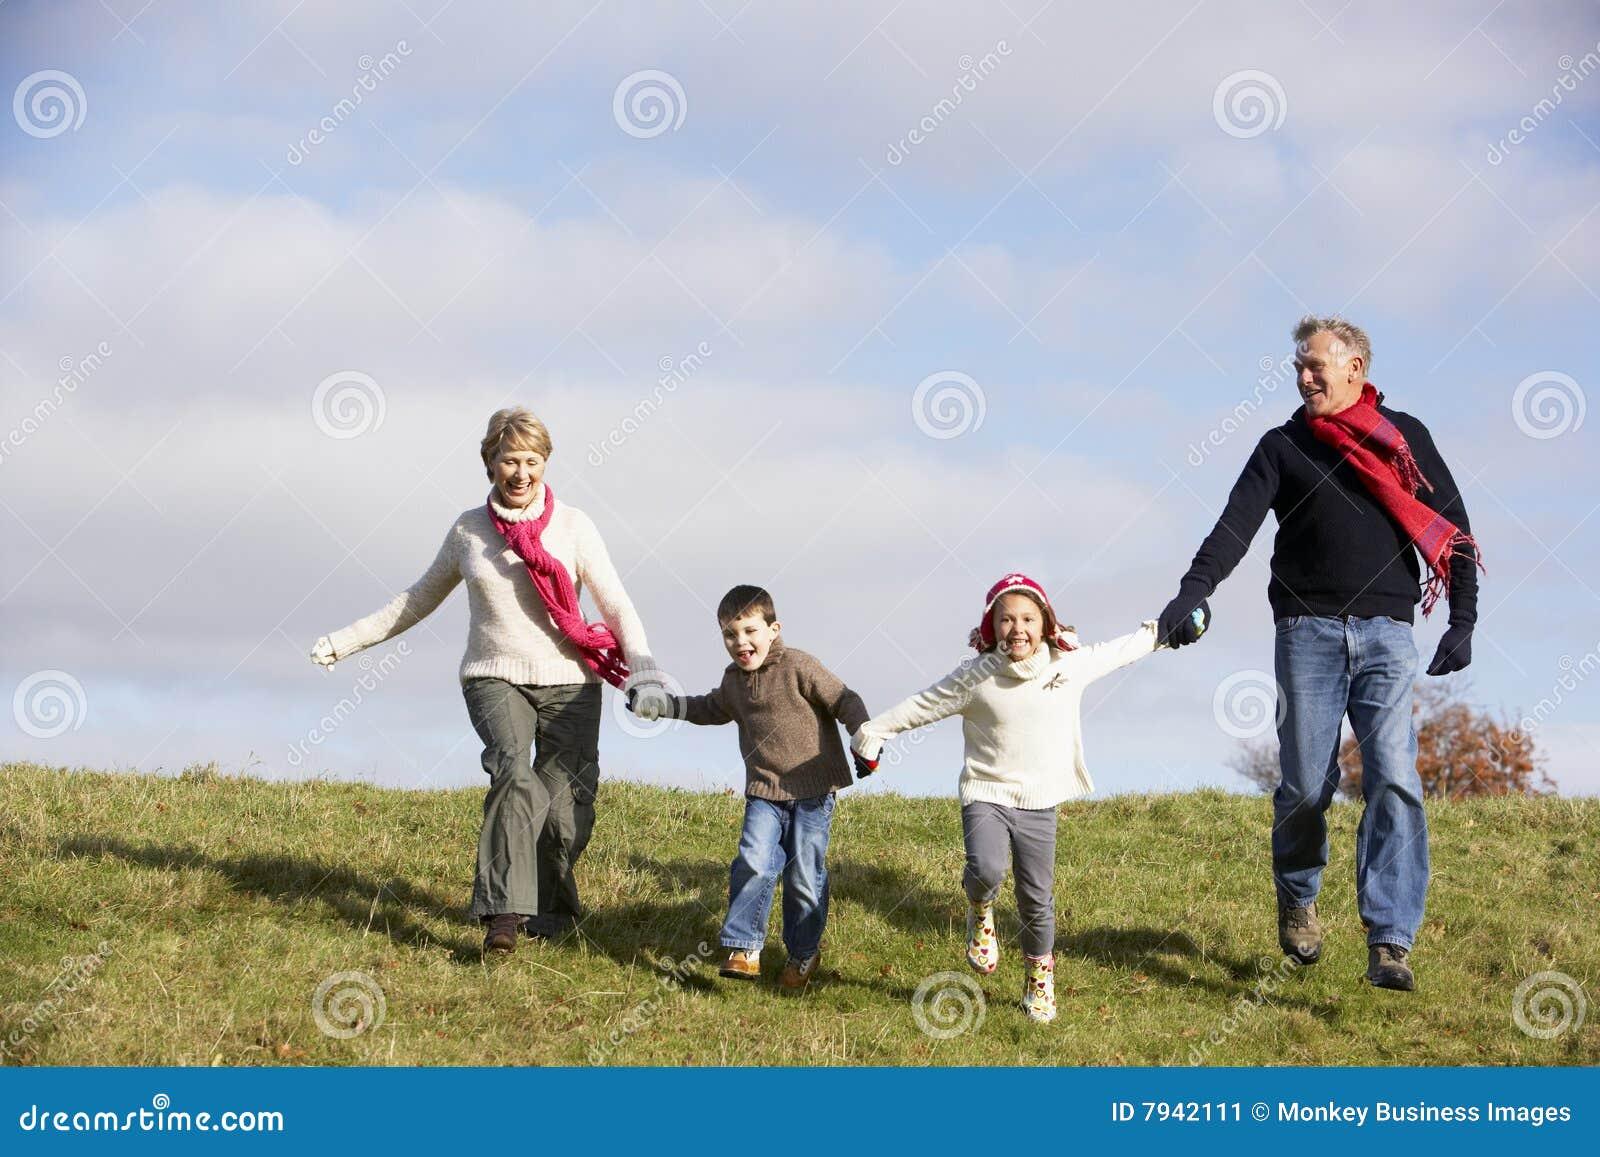 Grandparents And Grandchildren Running